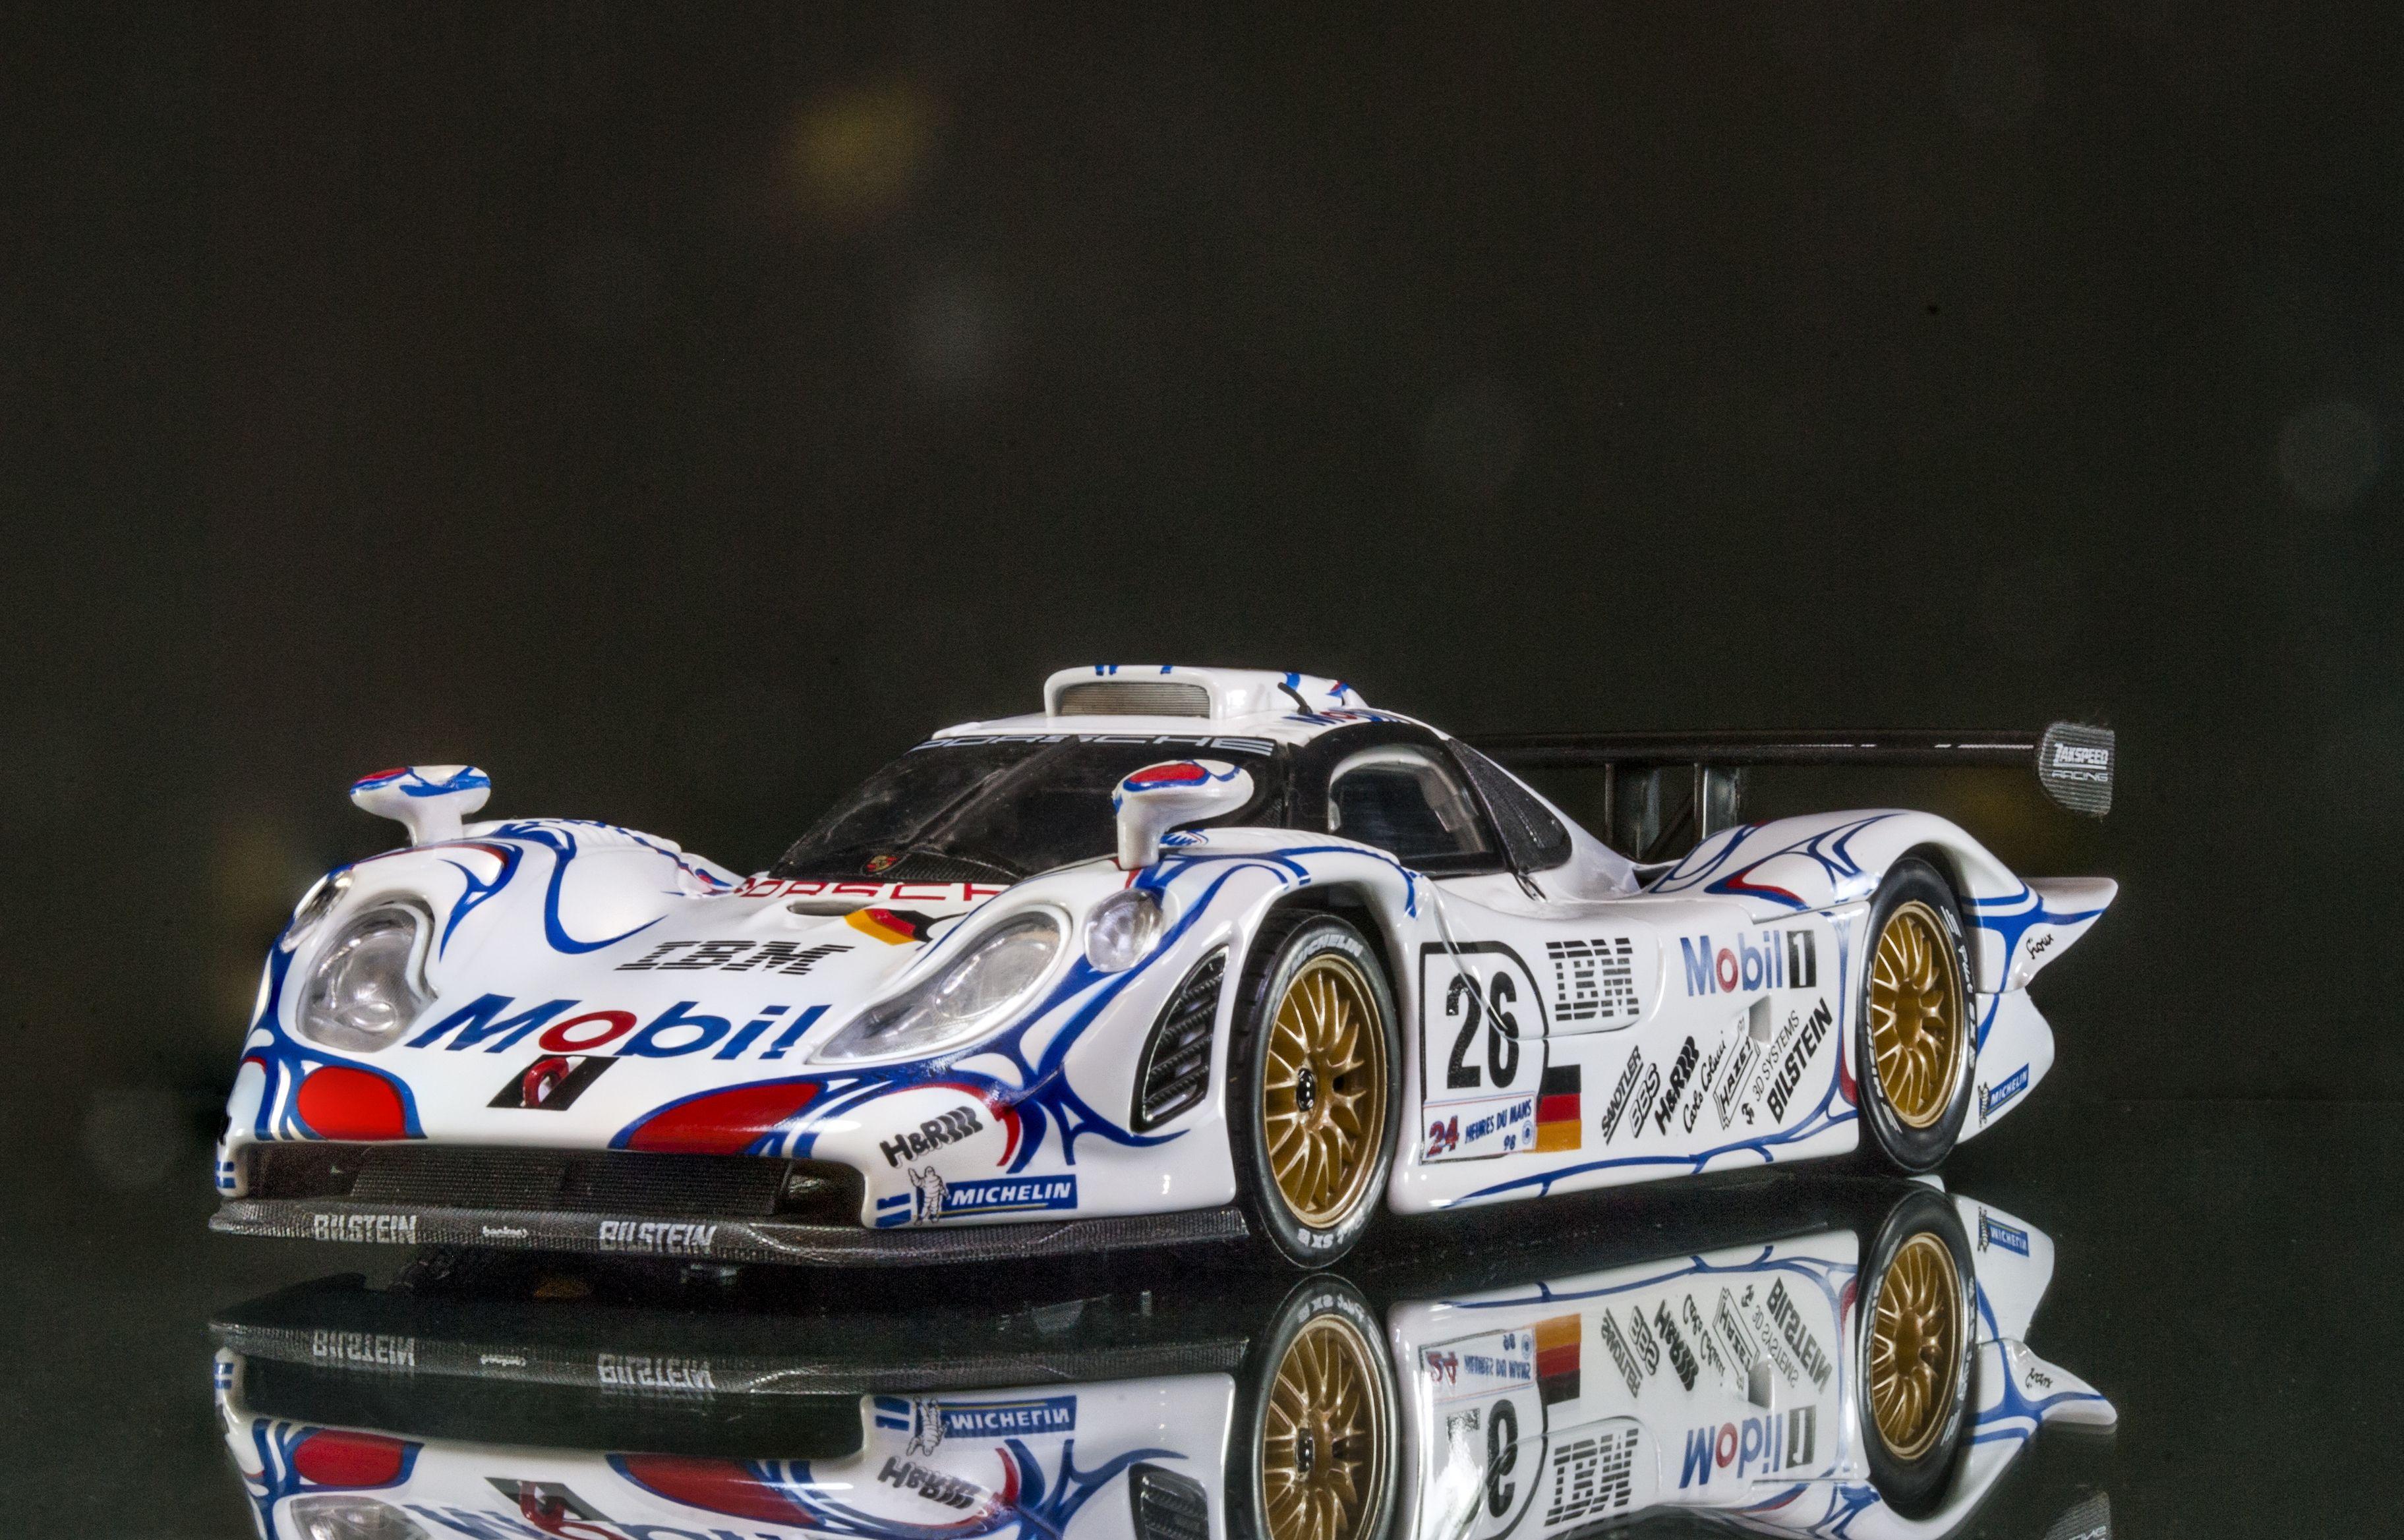 ab71bdc0f8e37032c985d0b35a97e89b Outstanding Maisto Porsche 911 Gt1 Le Mans 1998 Cars Trend